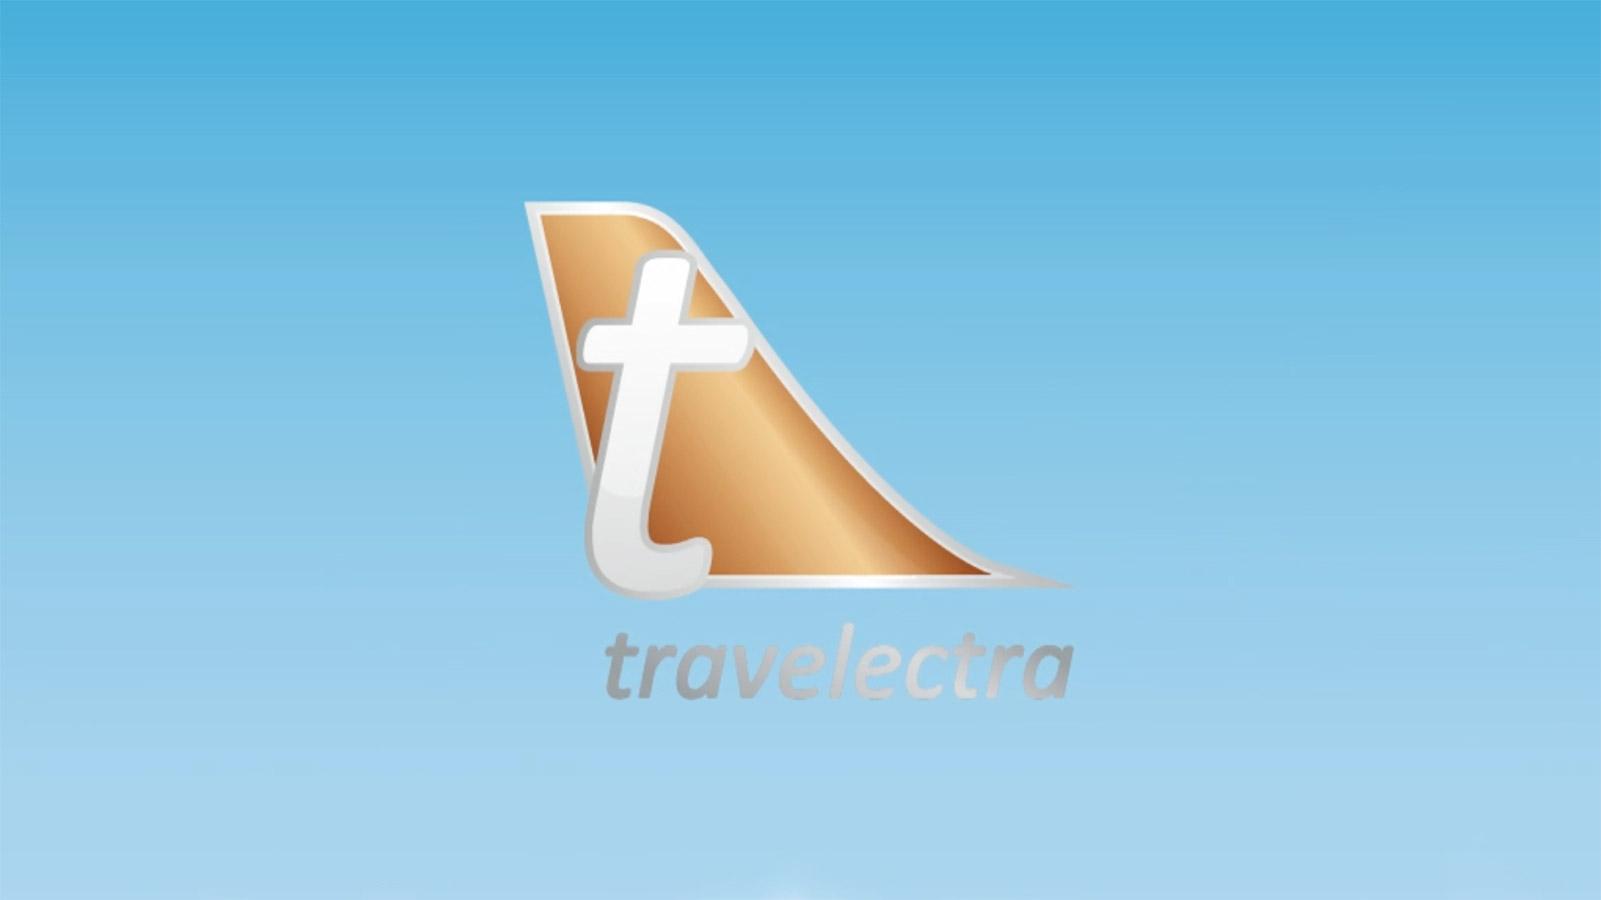 travelectra_thumb